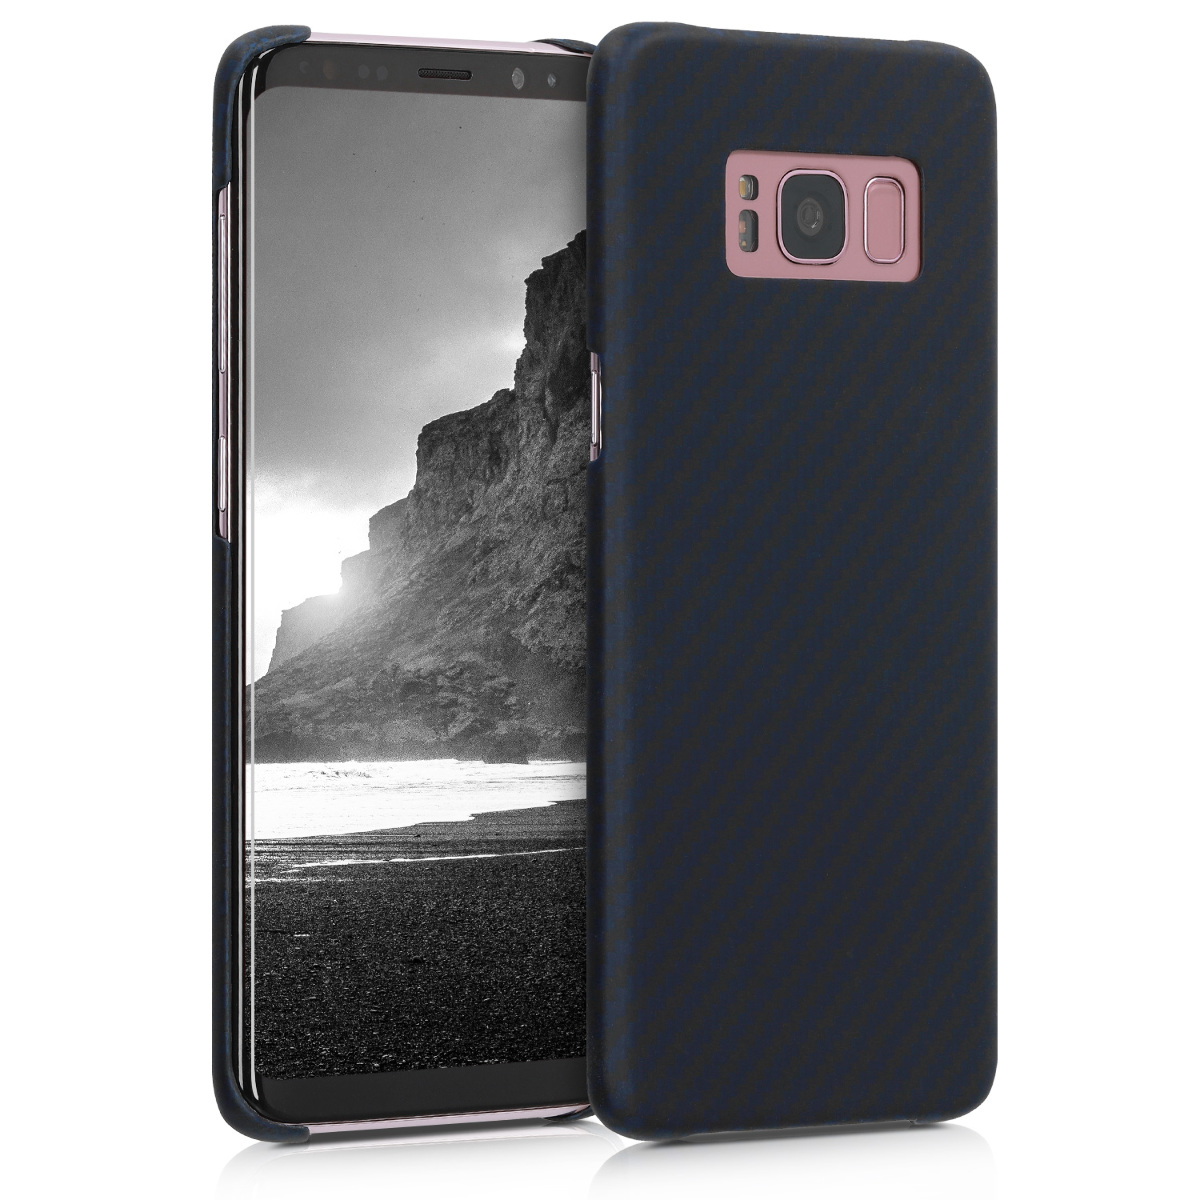 Aramidpouzdro pro Samsung S8 - tmavě modré